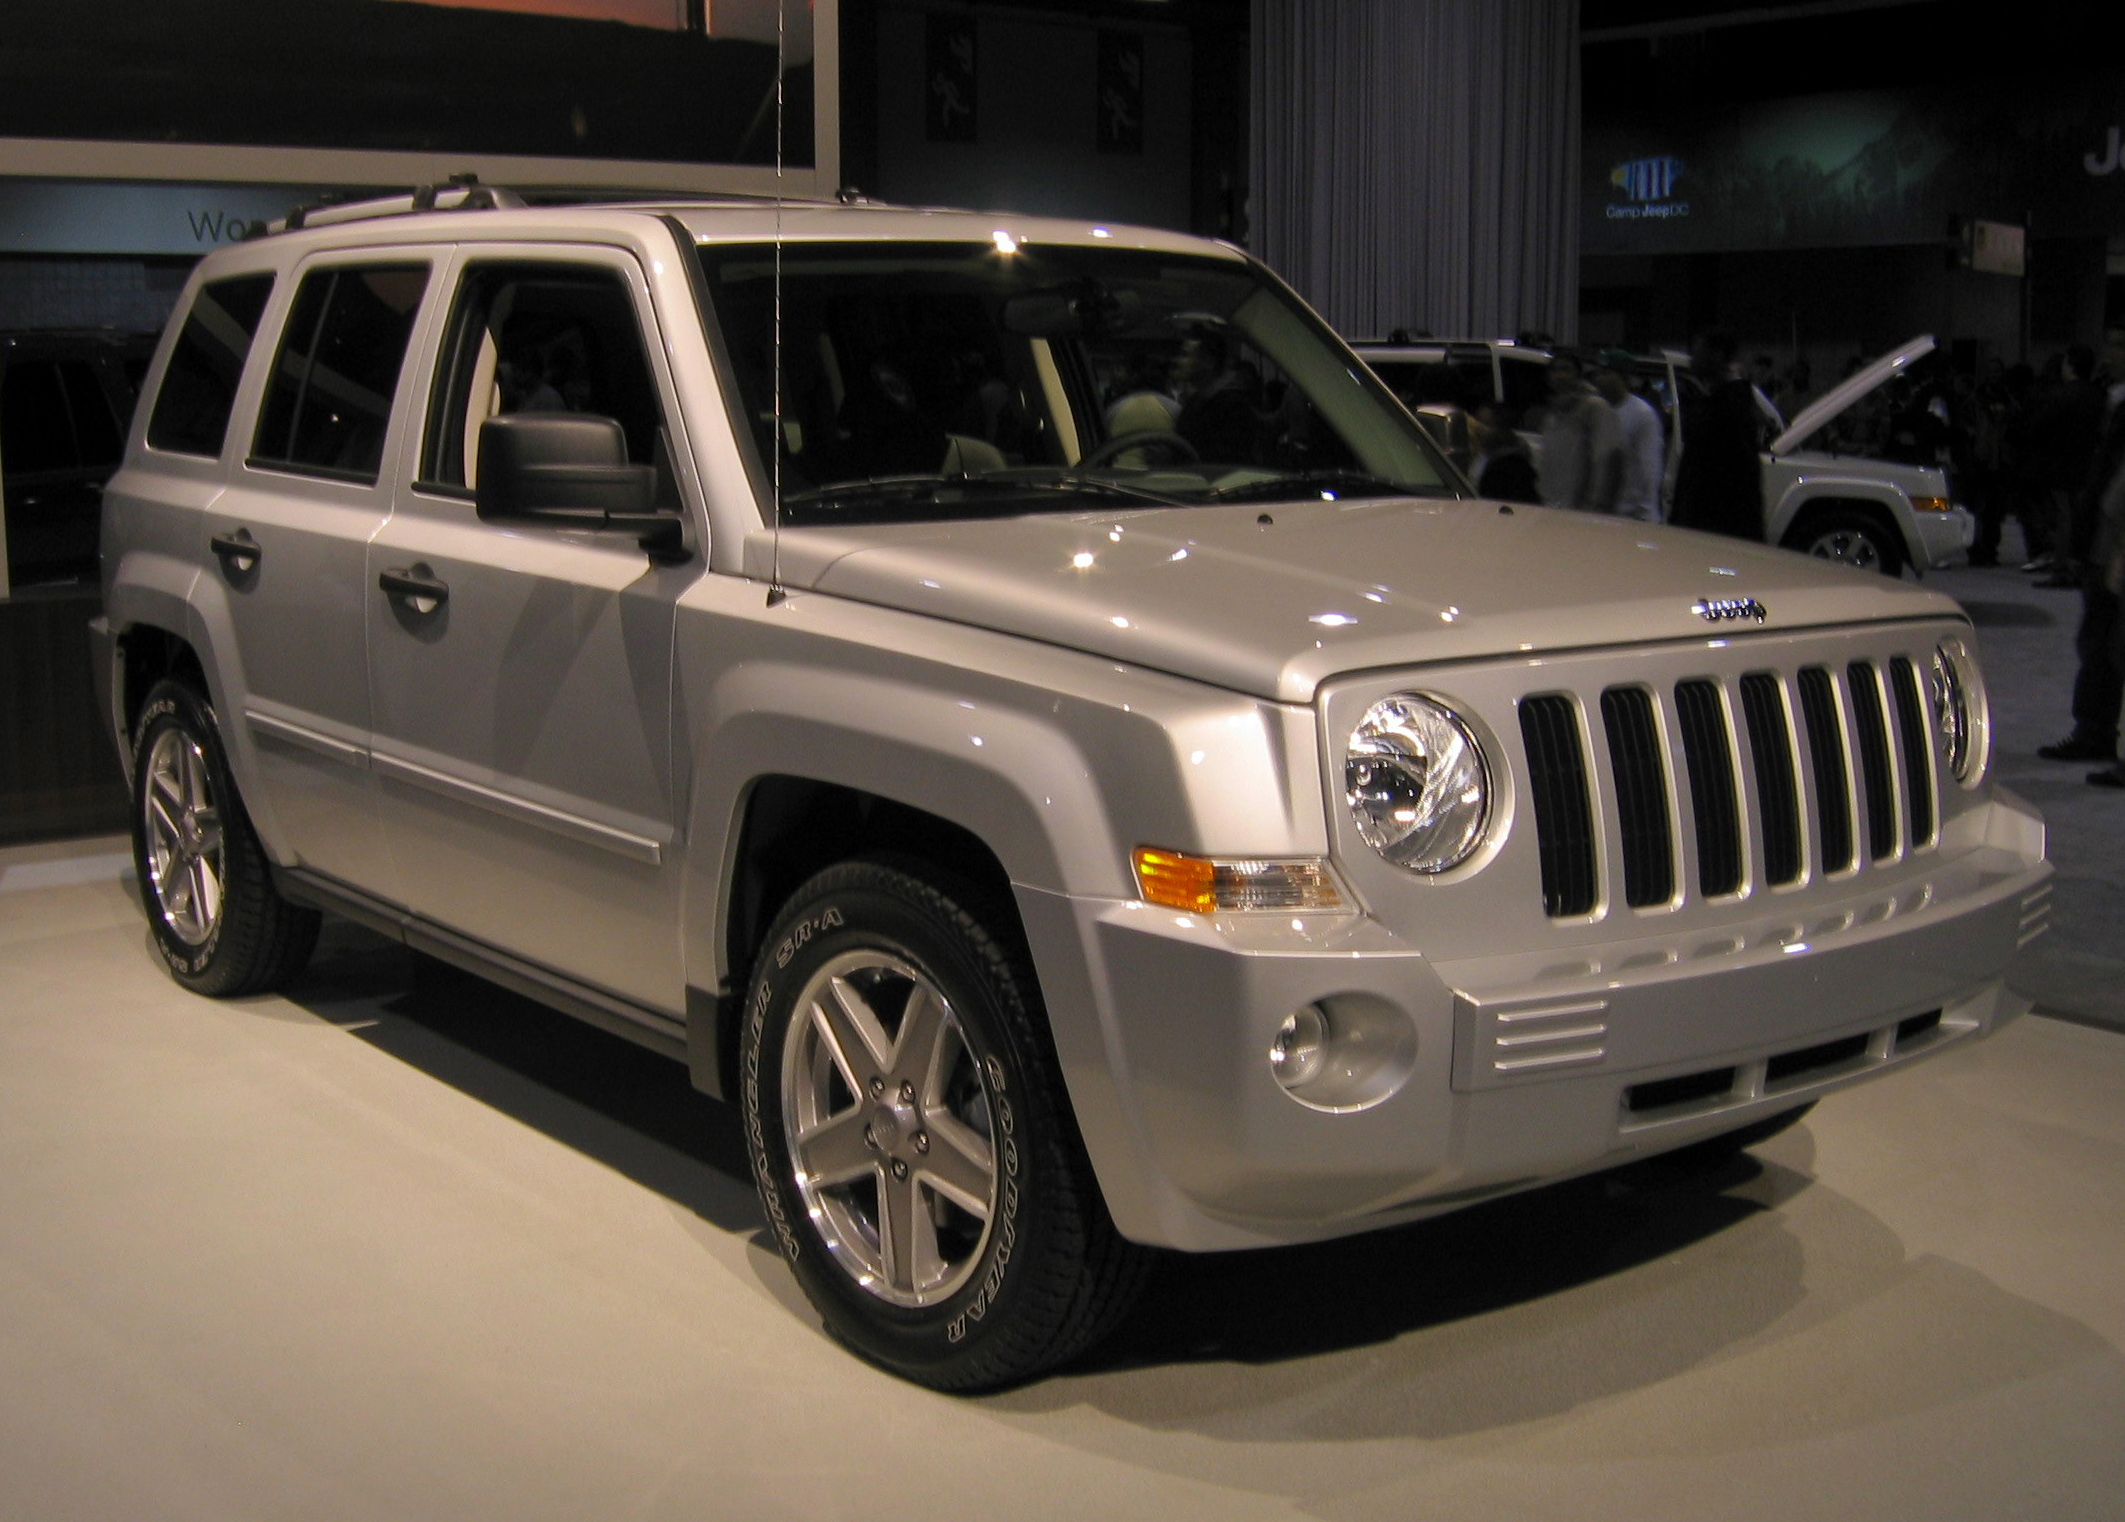 2007 jeep patriot - image #20